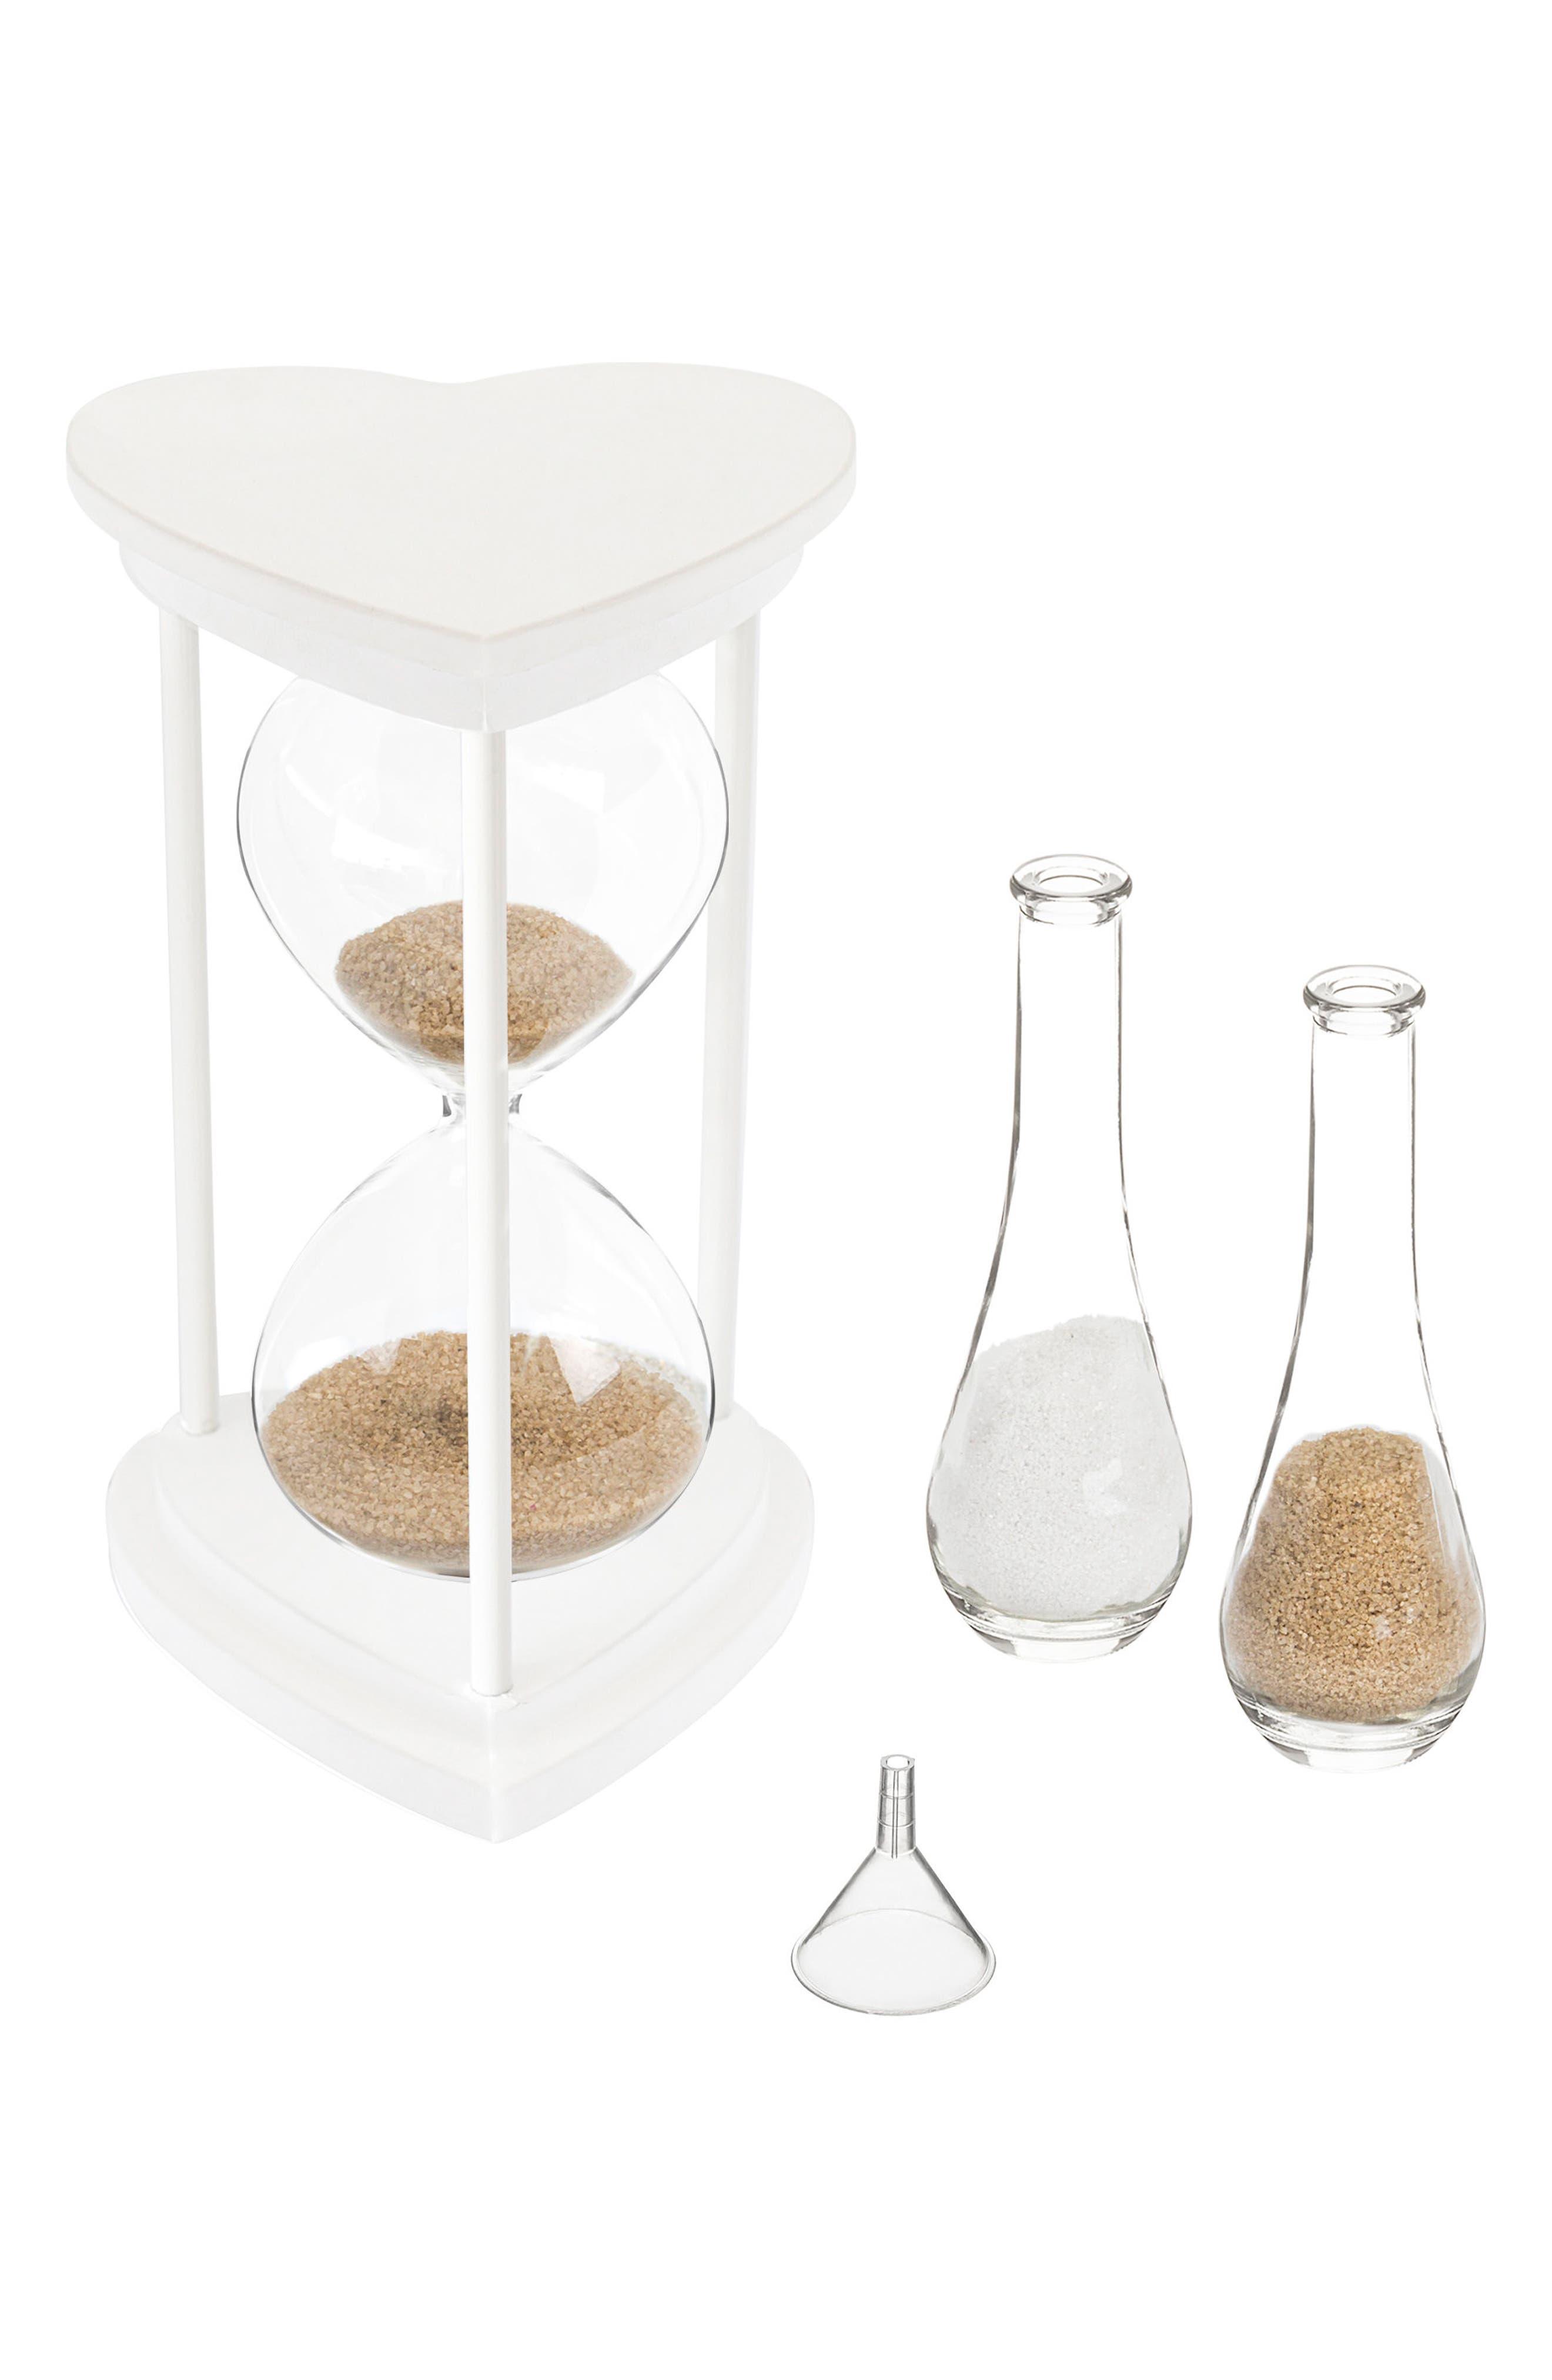 Monogram Unity Sand Ceremony Hourglass Set,                             Alternate thumbnail 7, color,